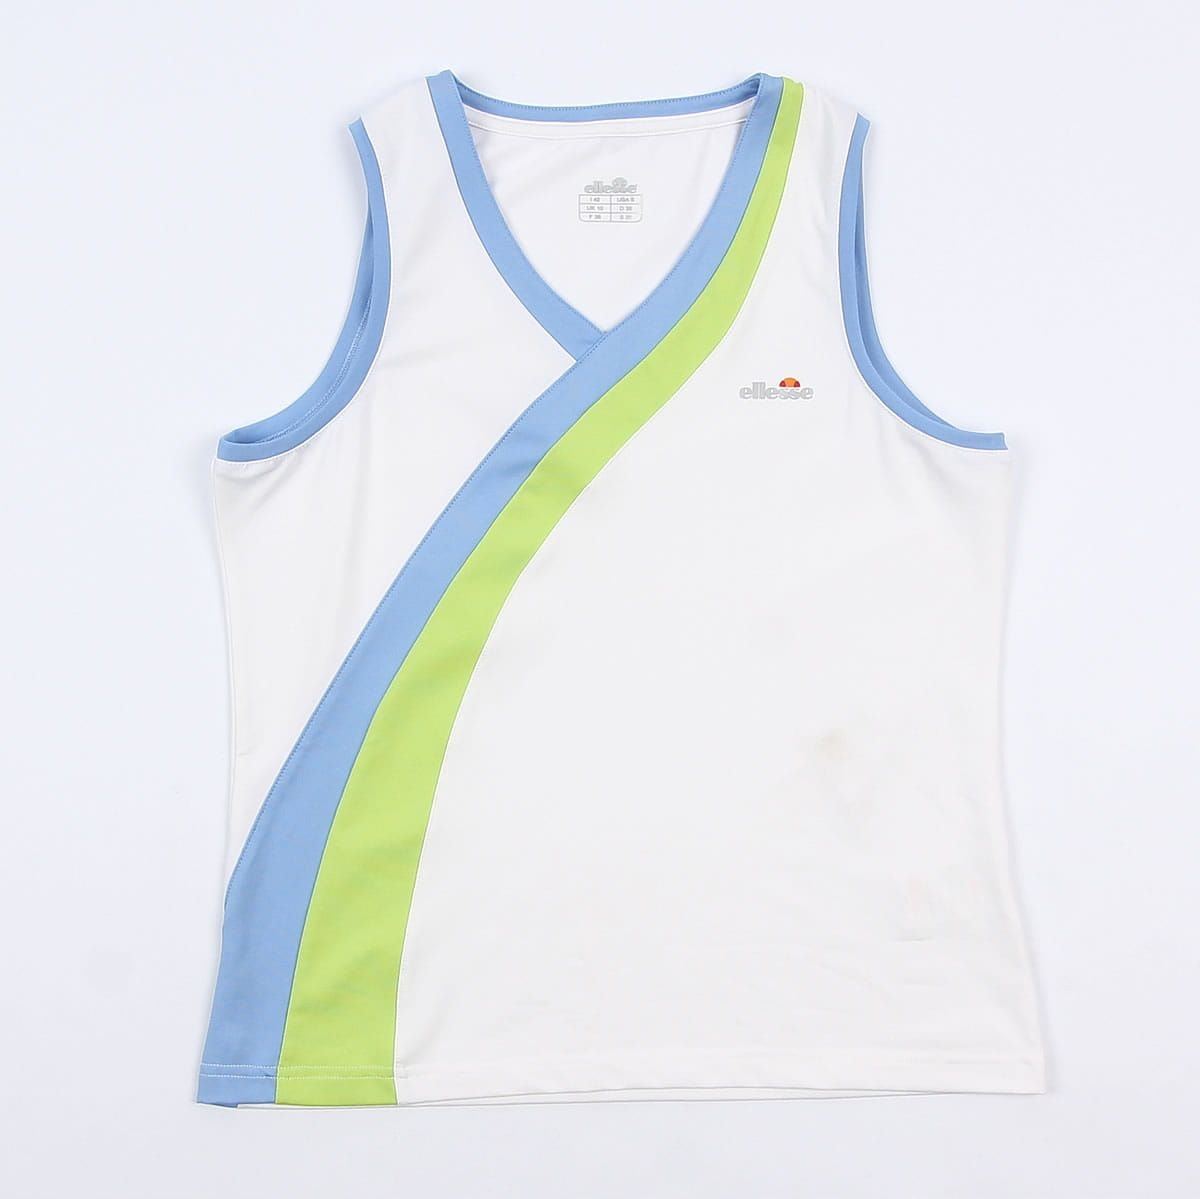 Koszulka do tenisa damska Ellesse S